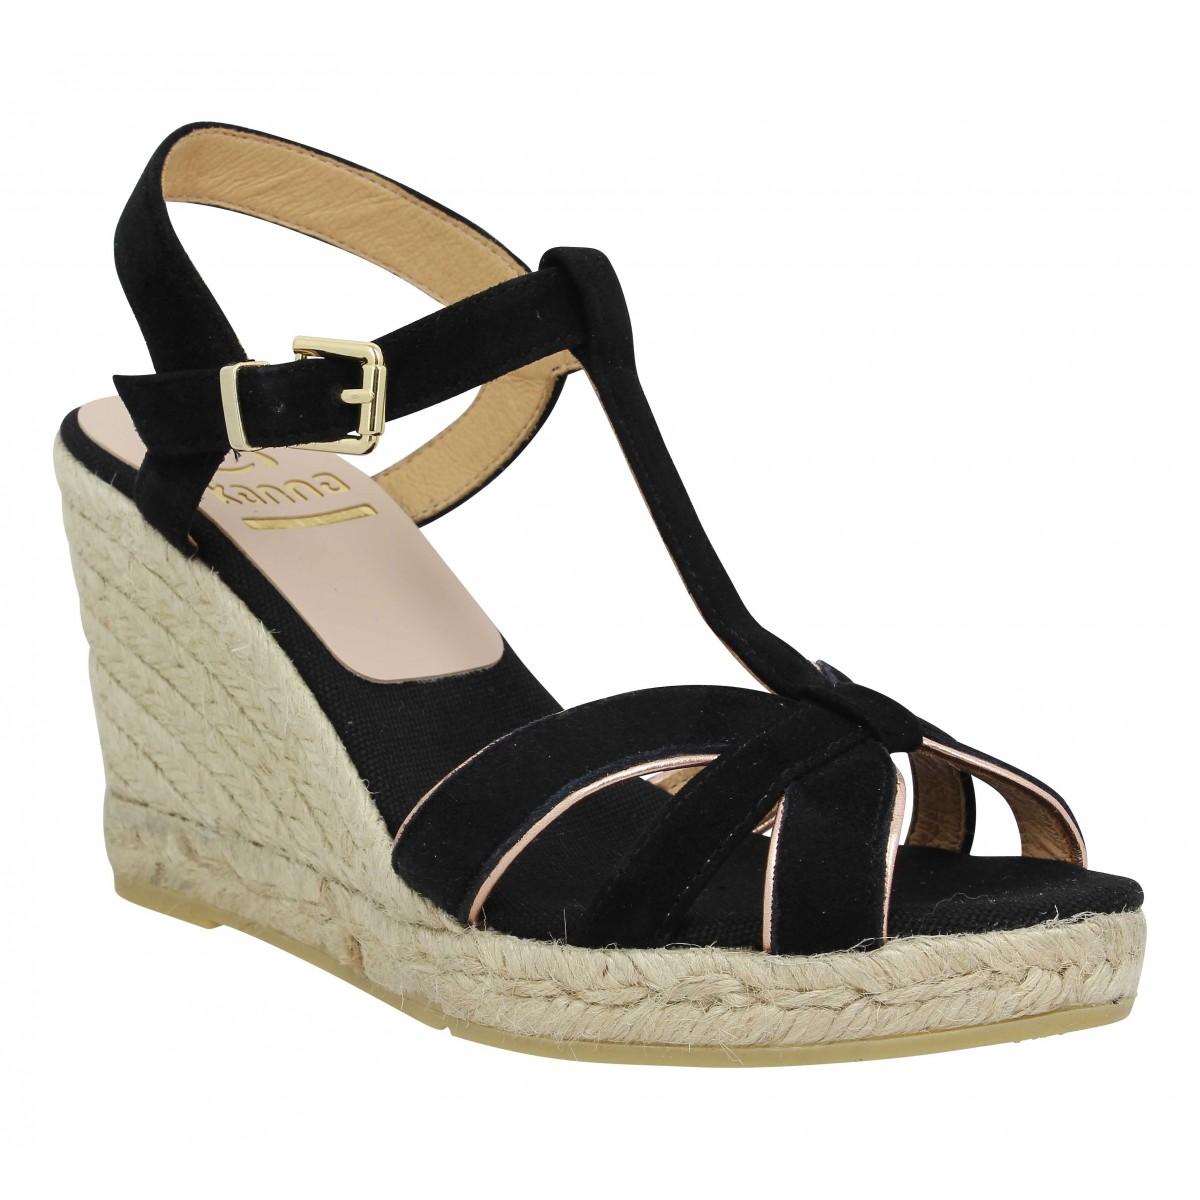 Sandales talons KANNA 8107 velours Femme Noir